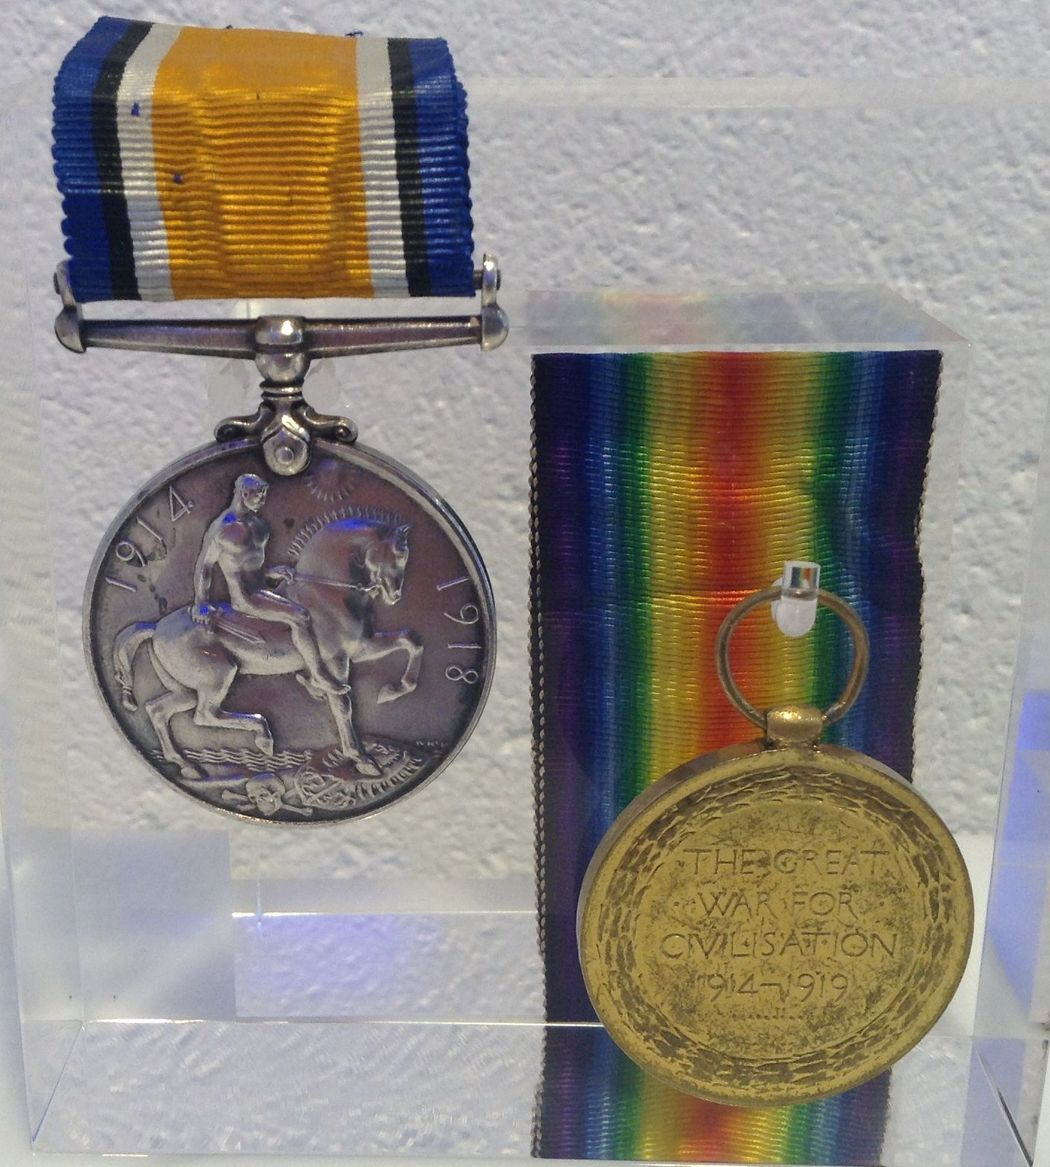 Robert Messer's medals